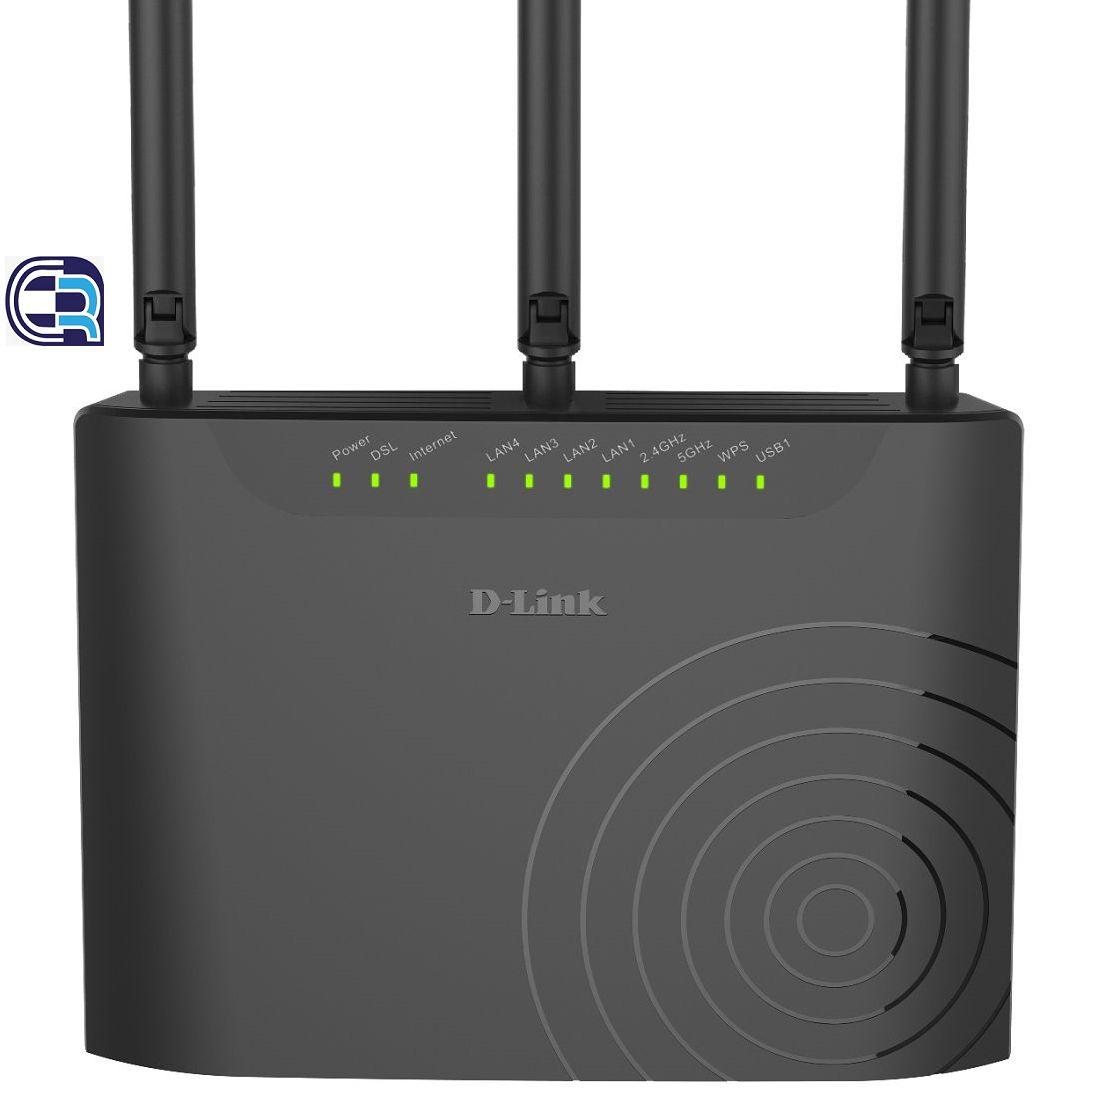 مودم روتر بیسیم +ADSL2 و +VDSL2 دی-لینک مدل DSL-2877AL